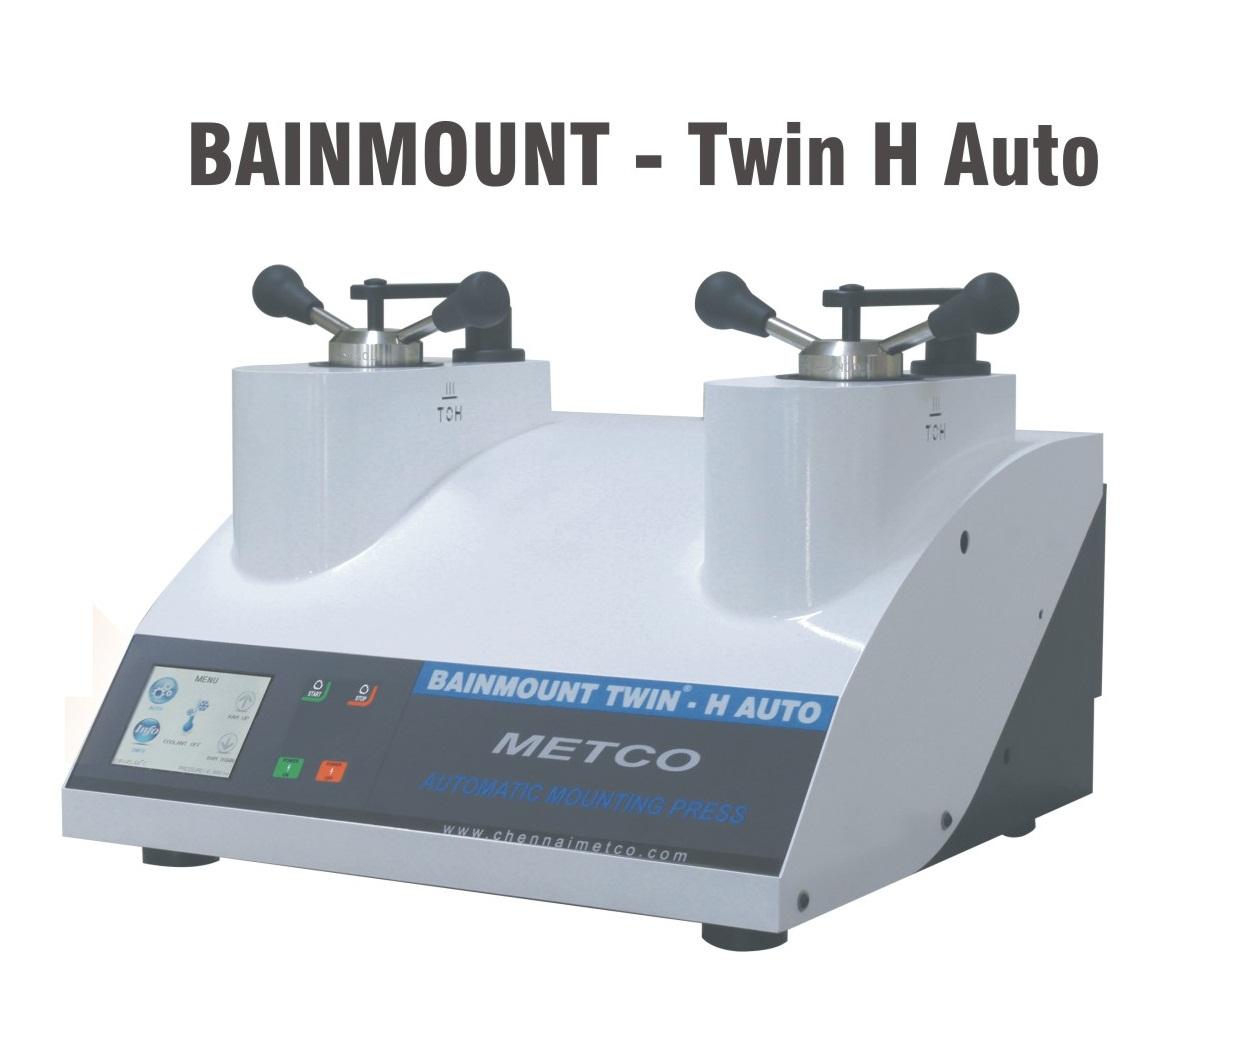 bainmount-twin-h-auto.jpg